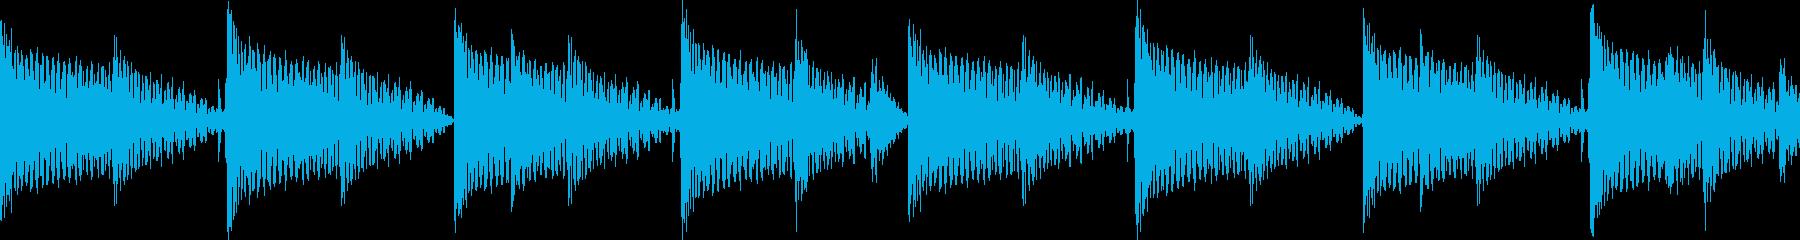 BPM128EDMリズムループキーFの再生済みの波形